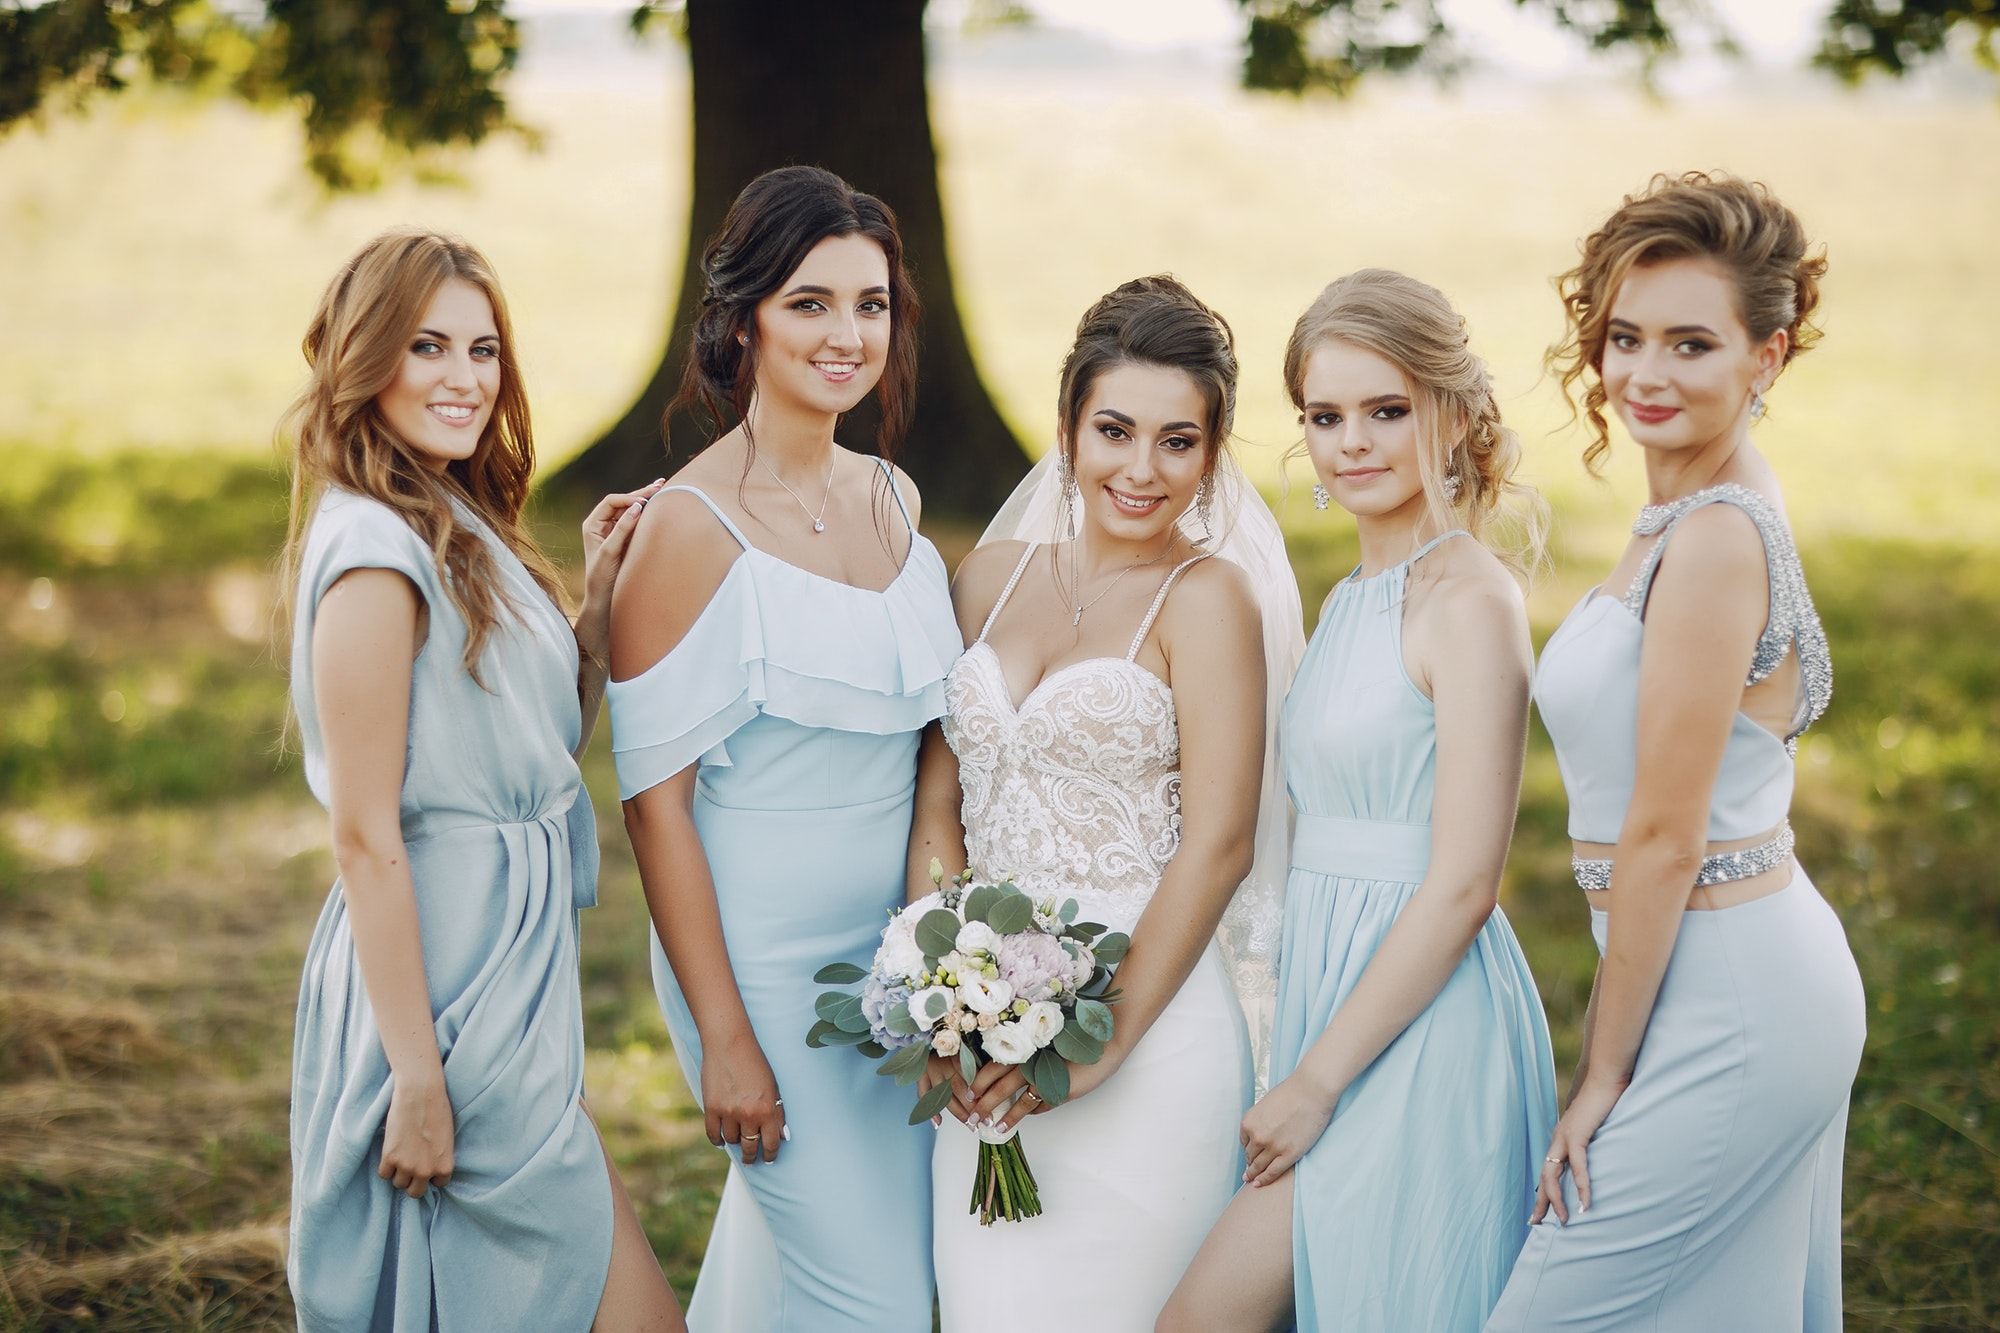 Bridesmaid gift ideas under 20